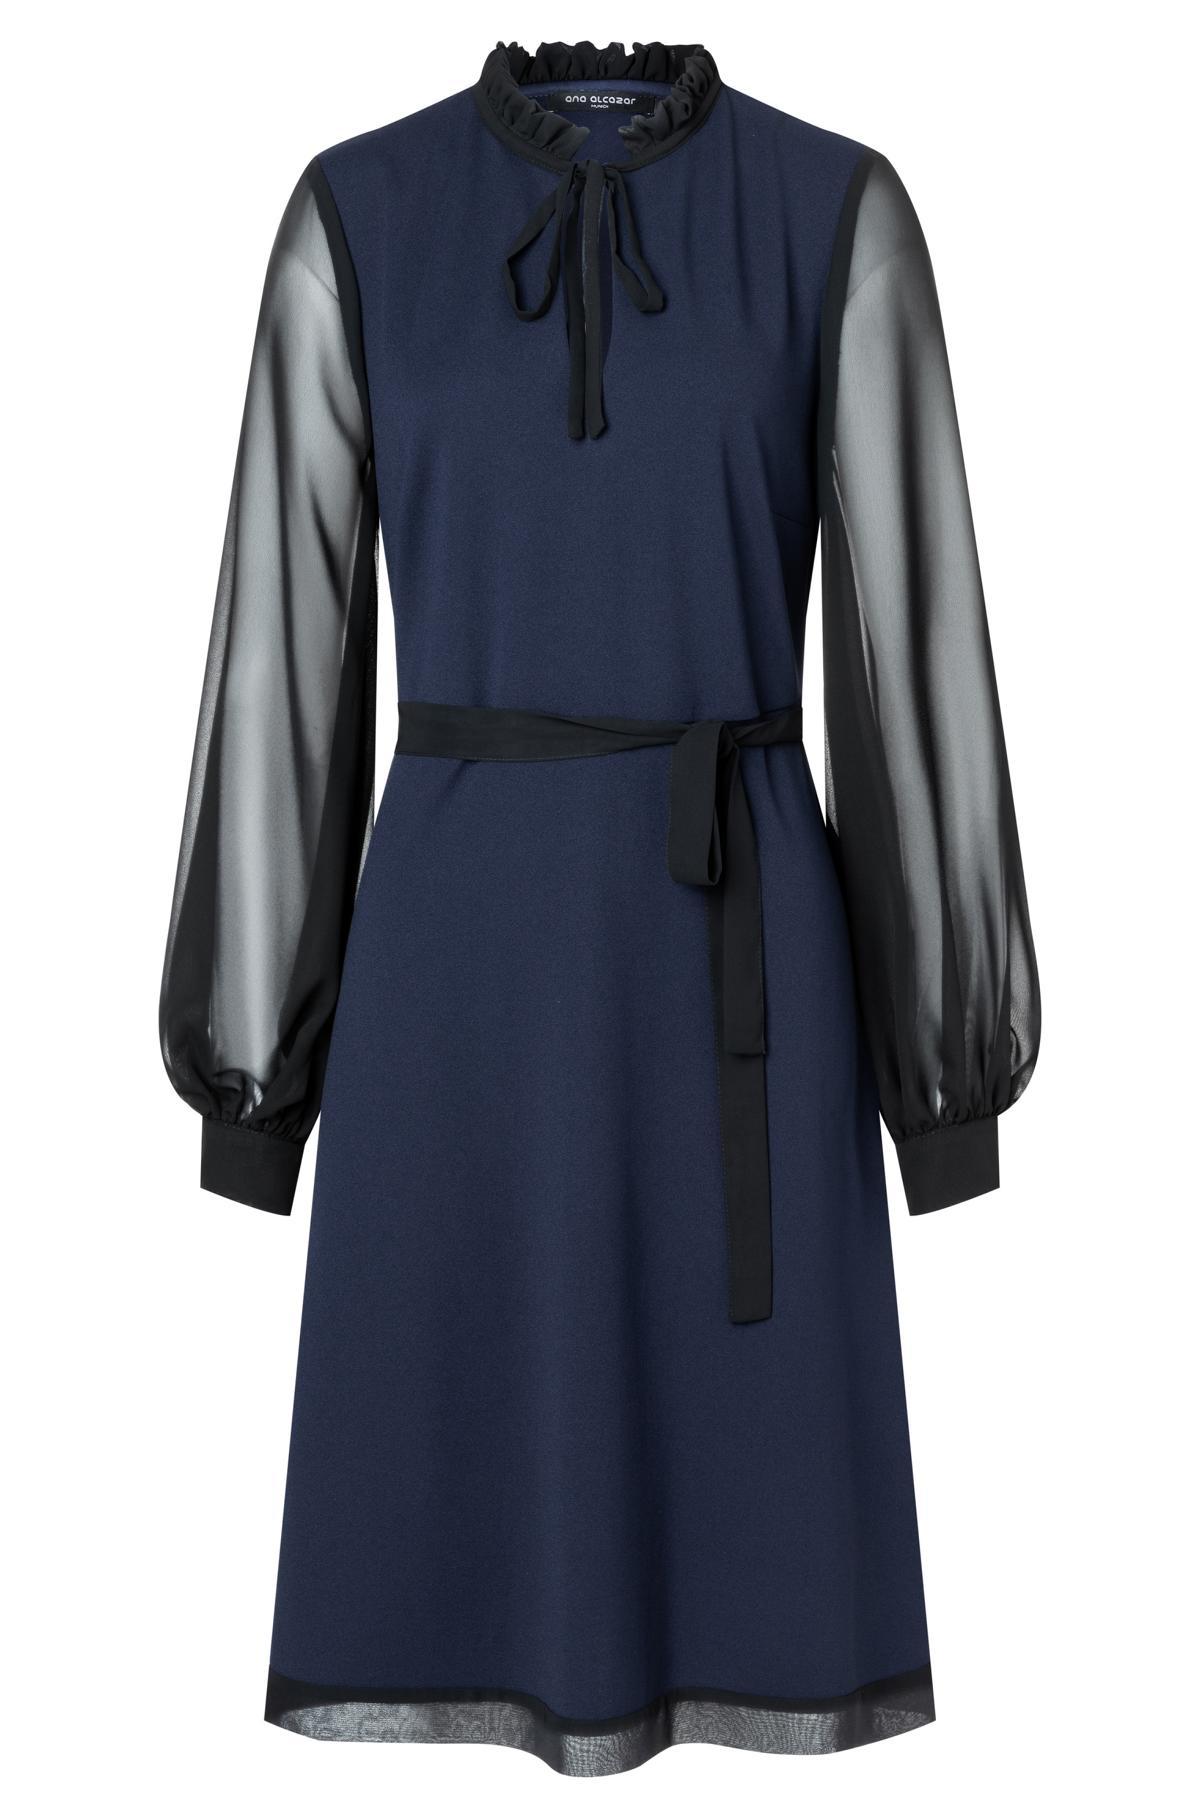 elegant tunic dress waery in blue with chiffon-sleeves   ana alcazar